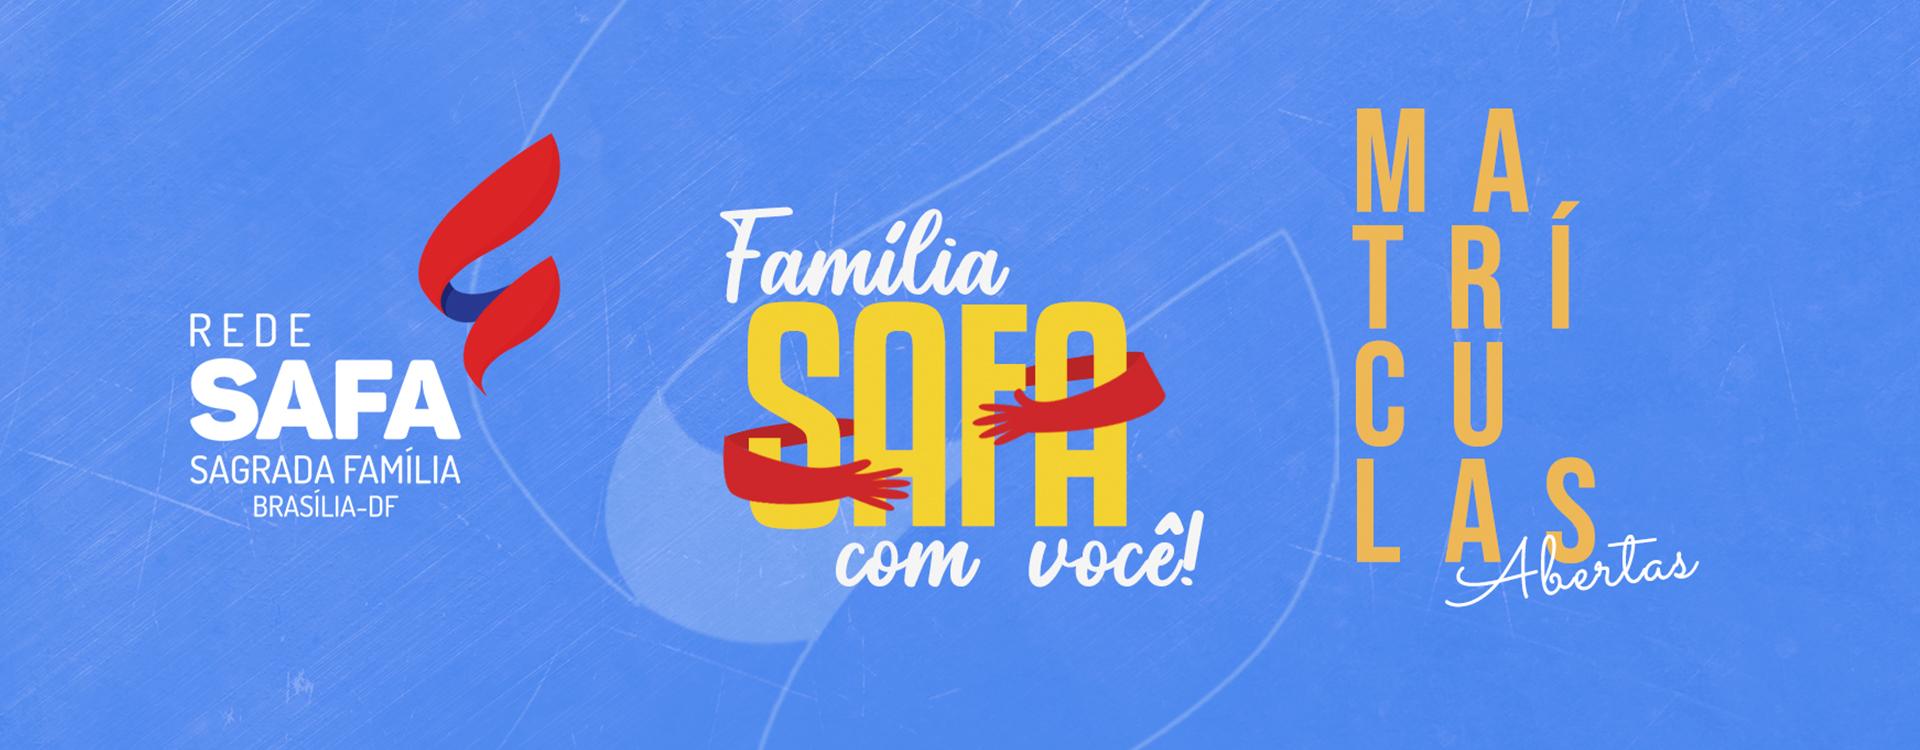 http://safa.com.br/site/wp-content/uploads/2020/10/Banner-site2.jpg